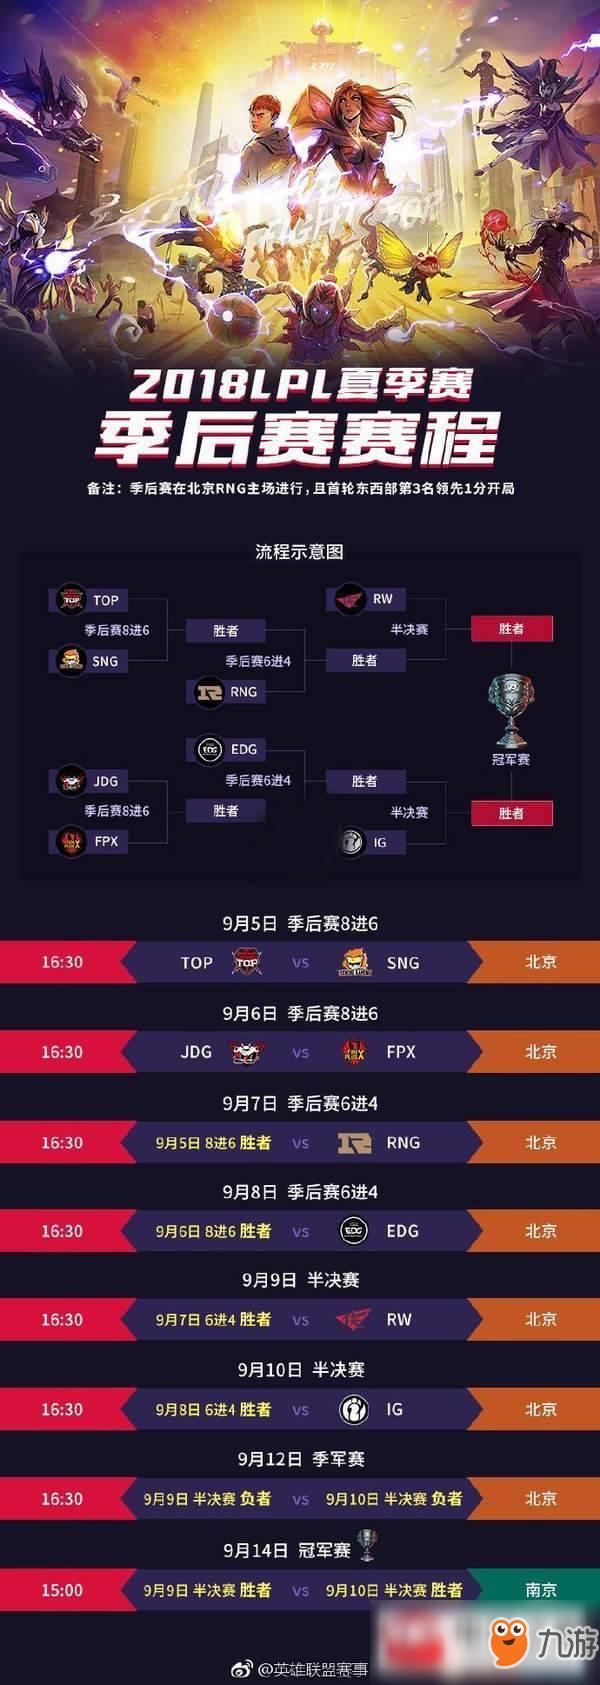 lol2018lpl夏季赛季后赛赛程时间表 lol2018lpl季后赛比赛队伍名单